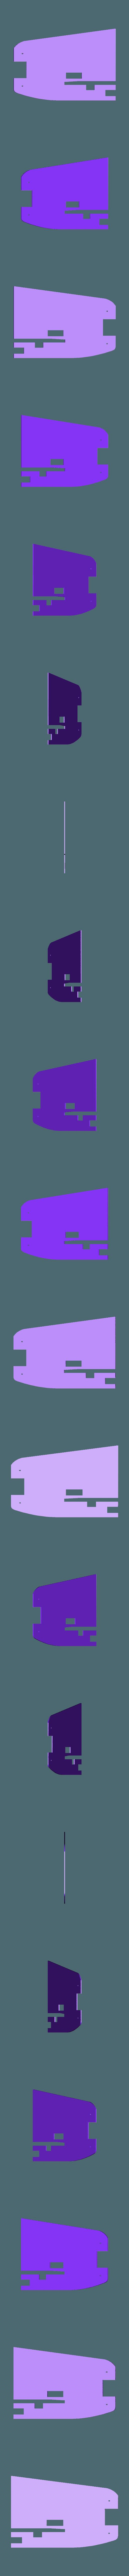 Body Front Rev01.STL Download free STL file V1 Release - New RC Plane • 3D printable design, Trikonics